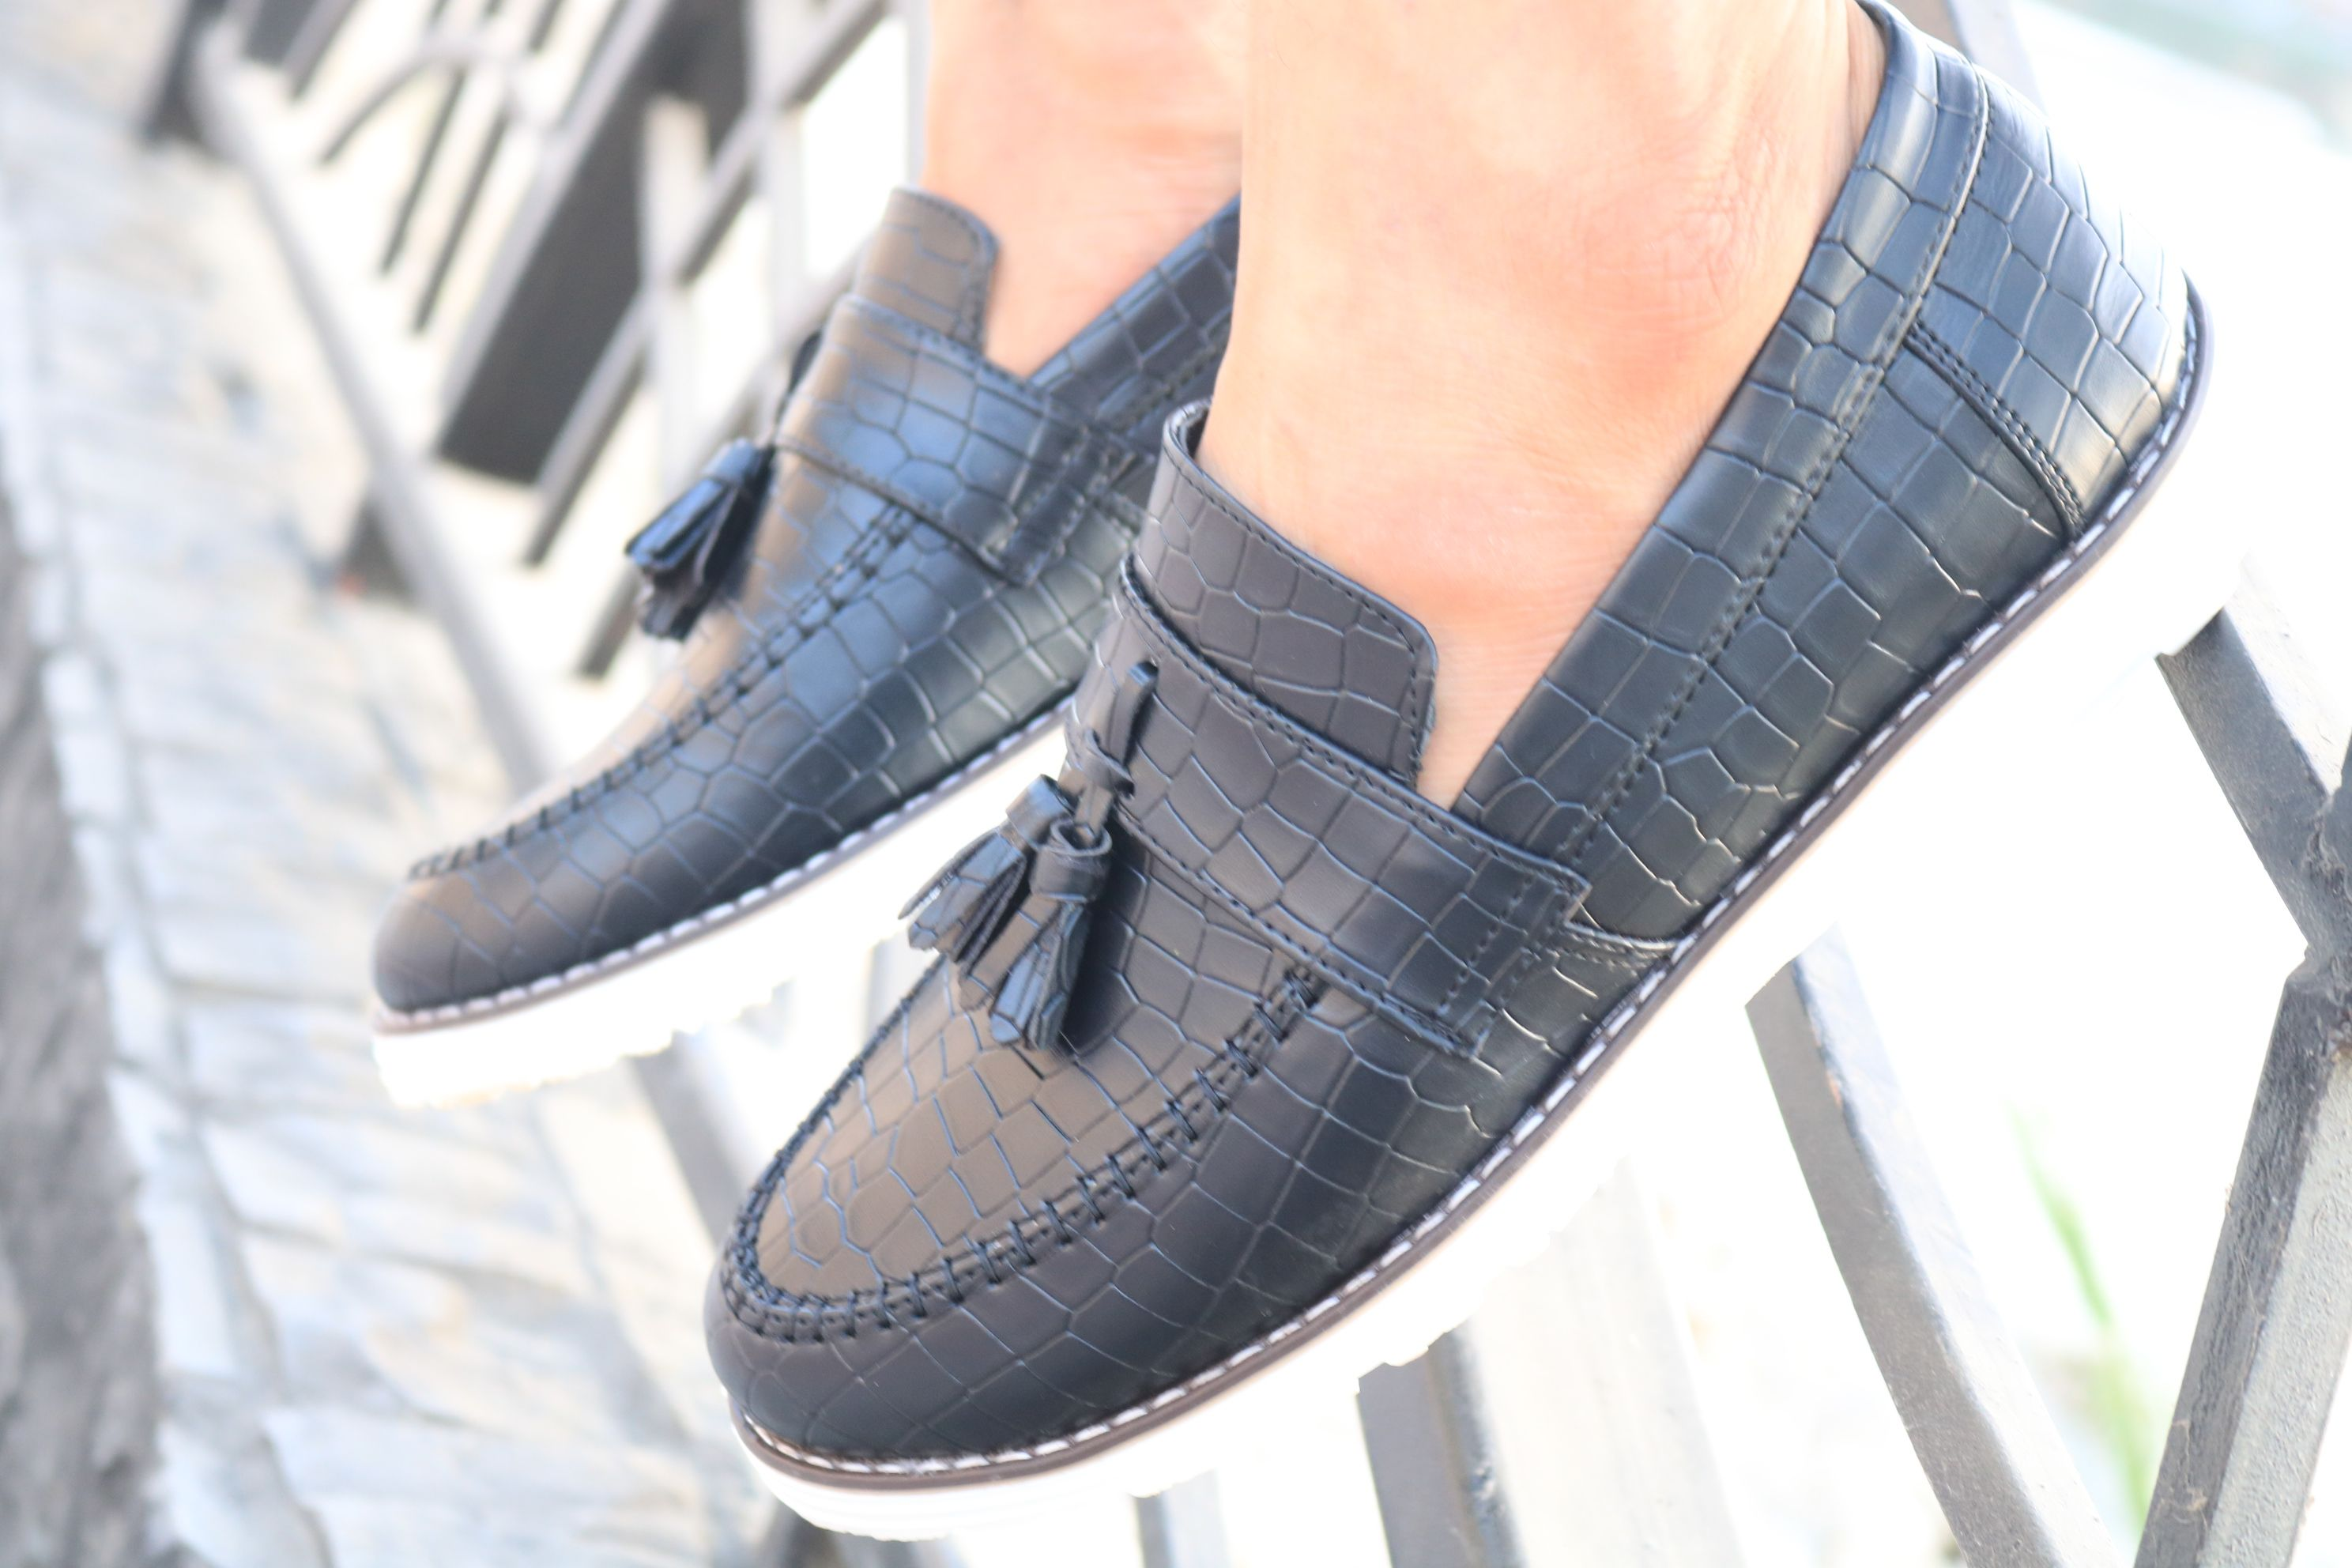 جزمة رزار بالابل علي الموضة ب 180ج Dress Shoes Men Loafers Men Oxford Shoes